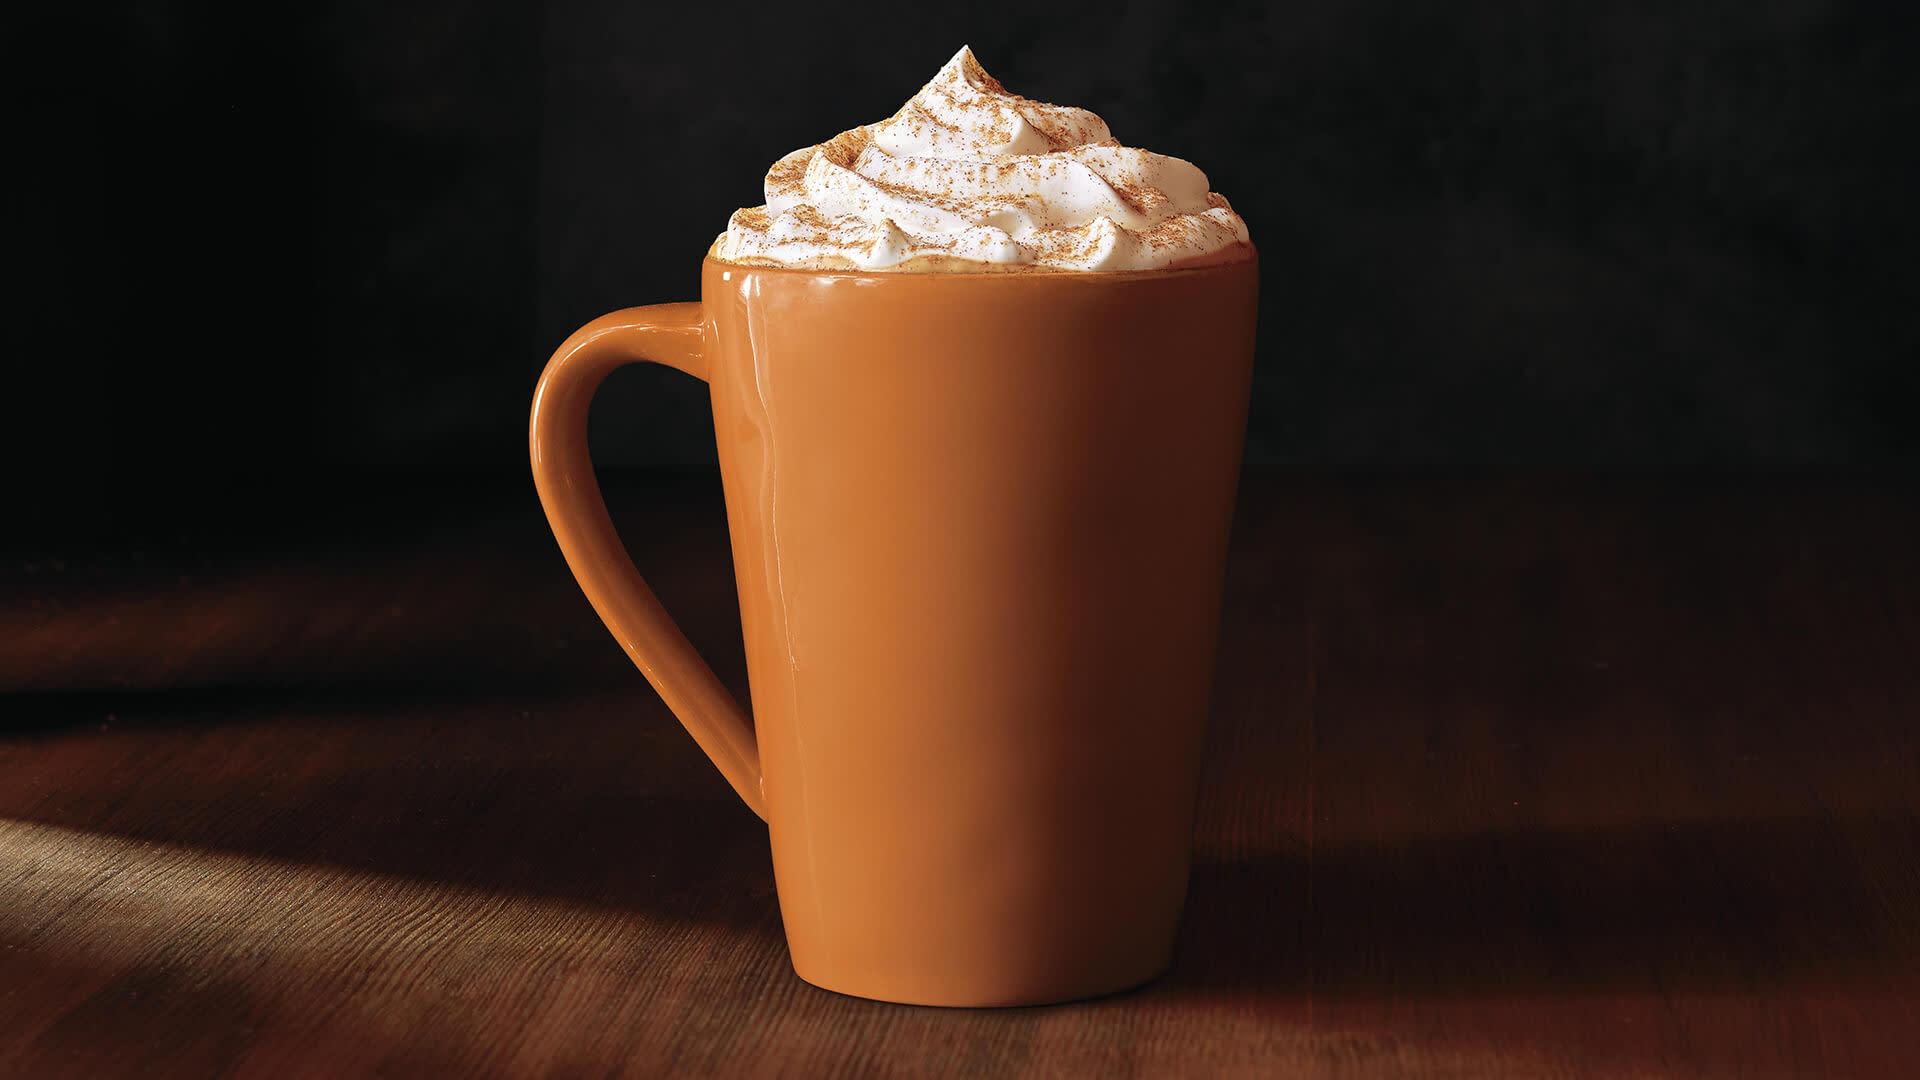 Watch Starbucks Announces Major Changes to Its Pumpkin Spice Latte video